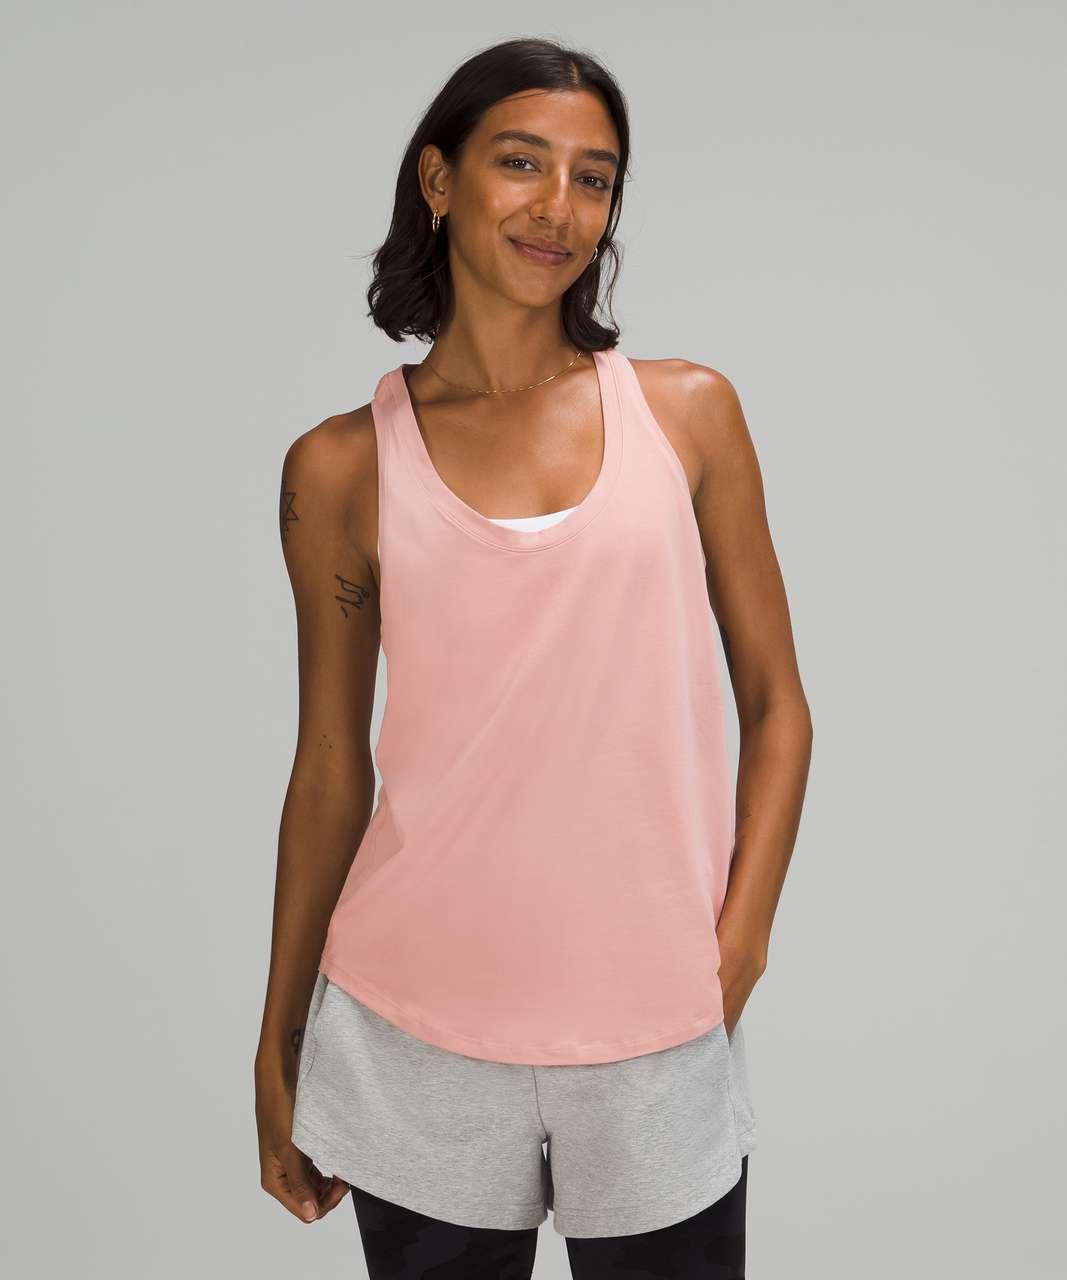 Lululemon Love Tank - Pink Puff